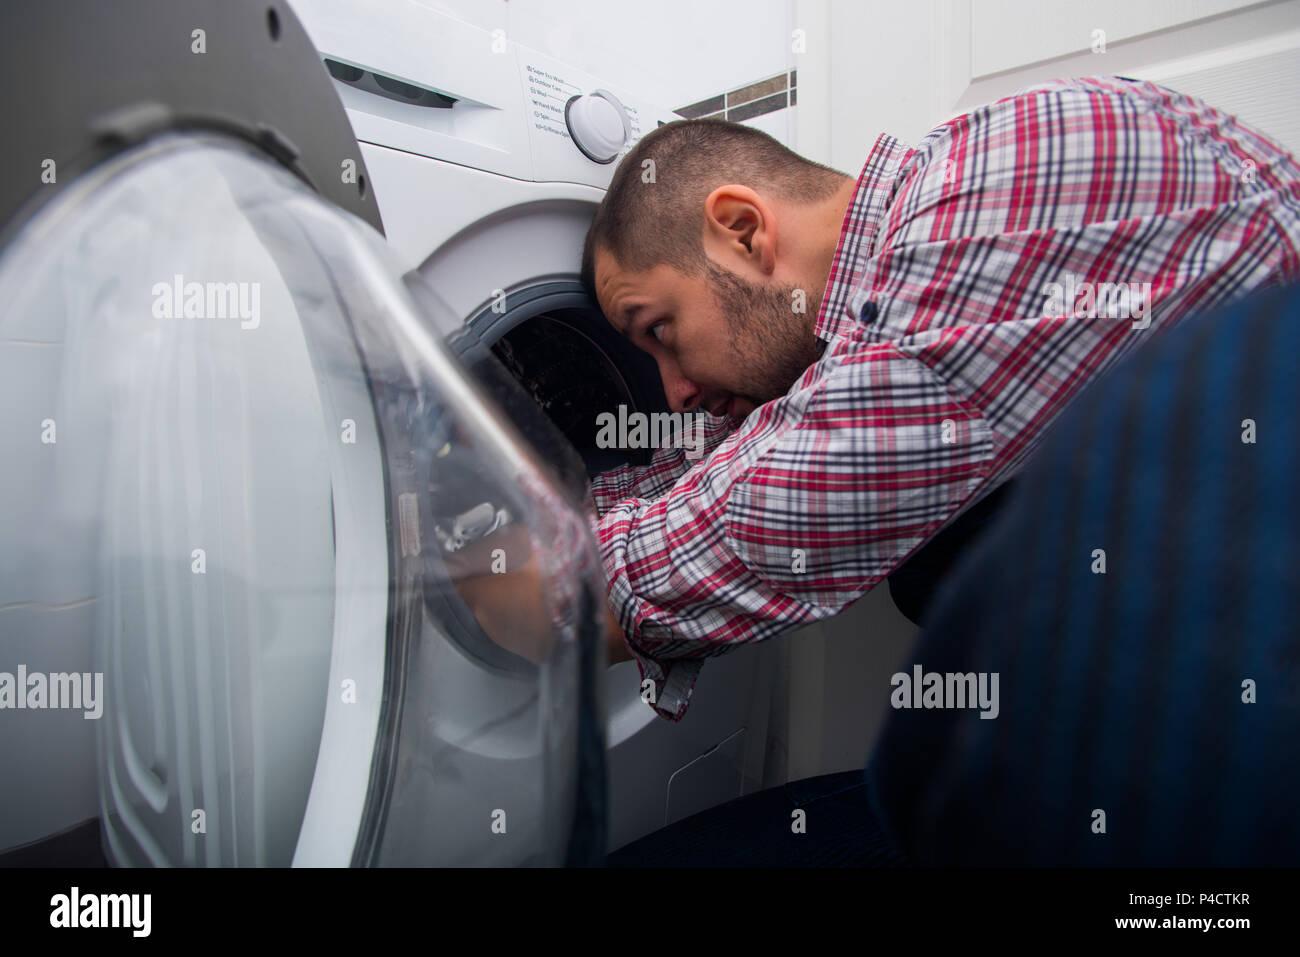 Repair man fixing the washing machine in the bathroom - Stock Image